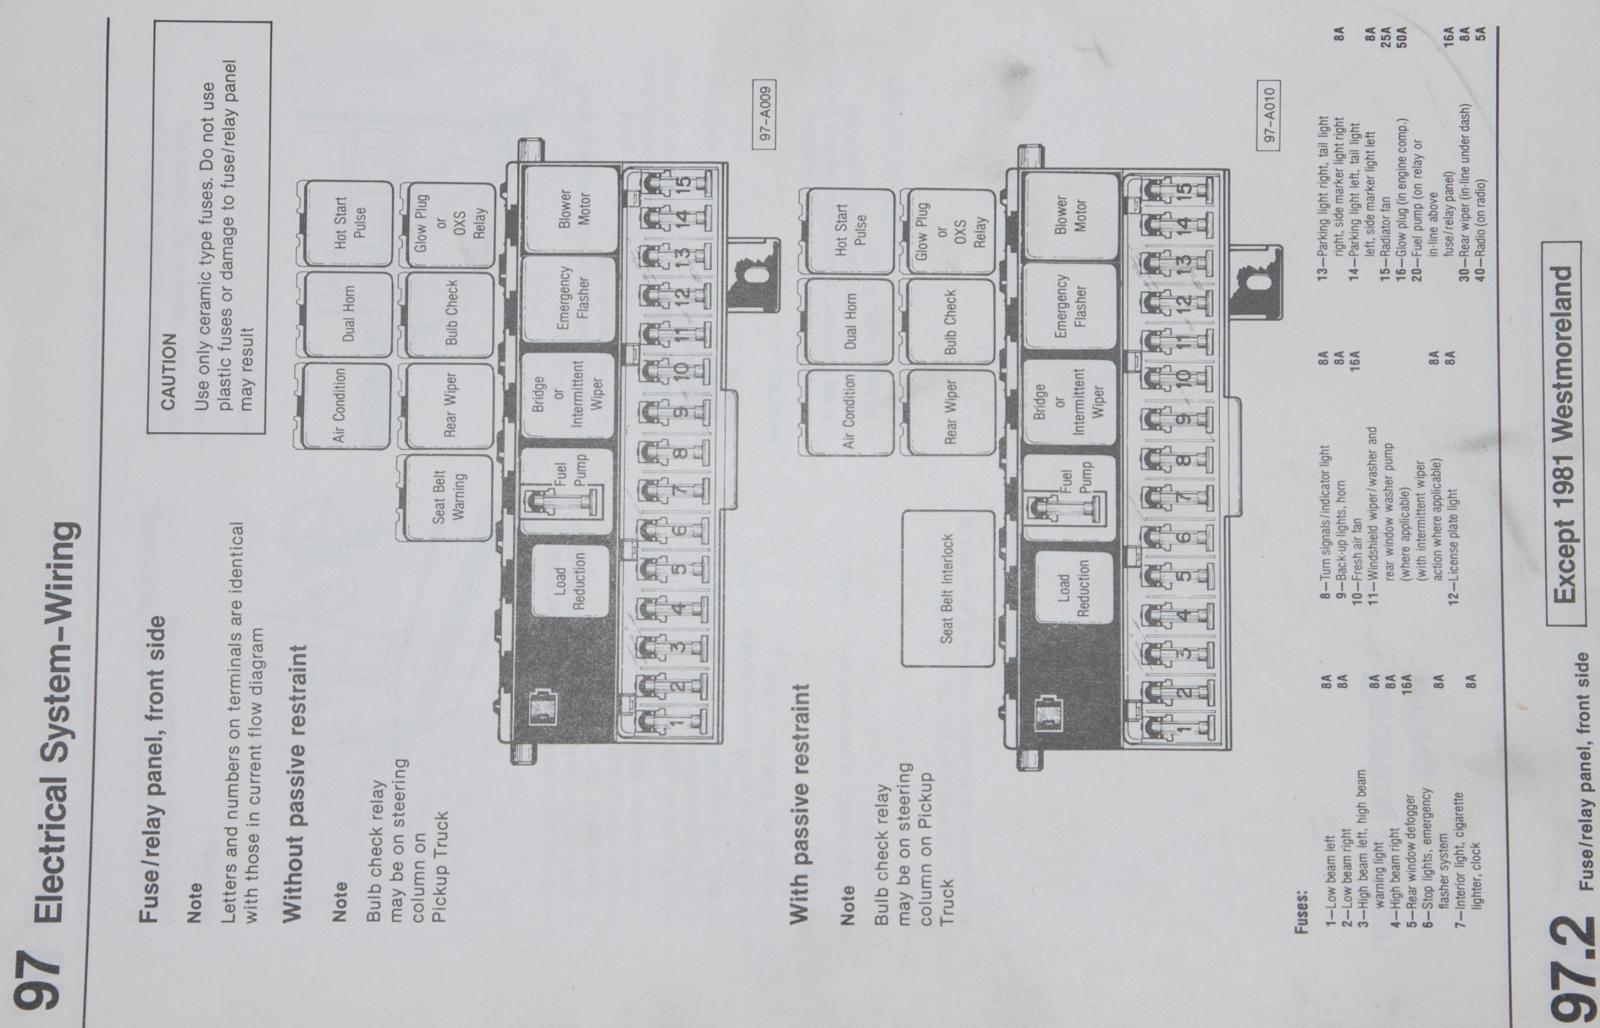 pats wiring 2005 ford taurus ecm pins